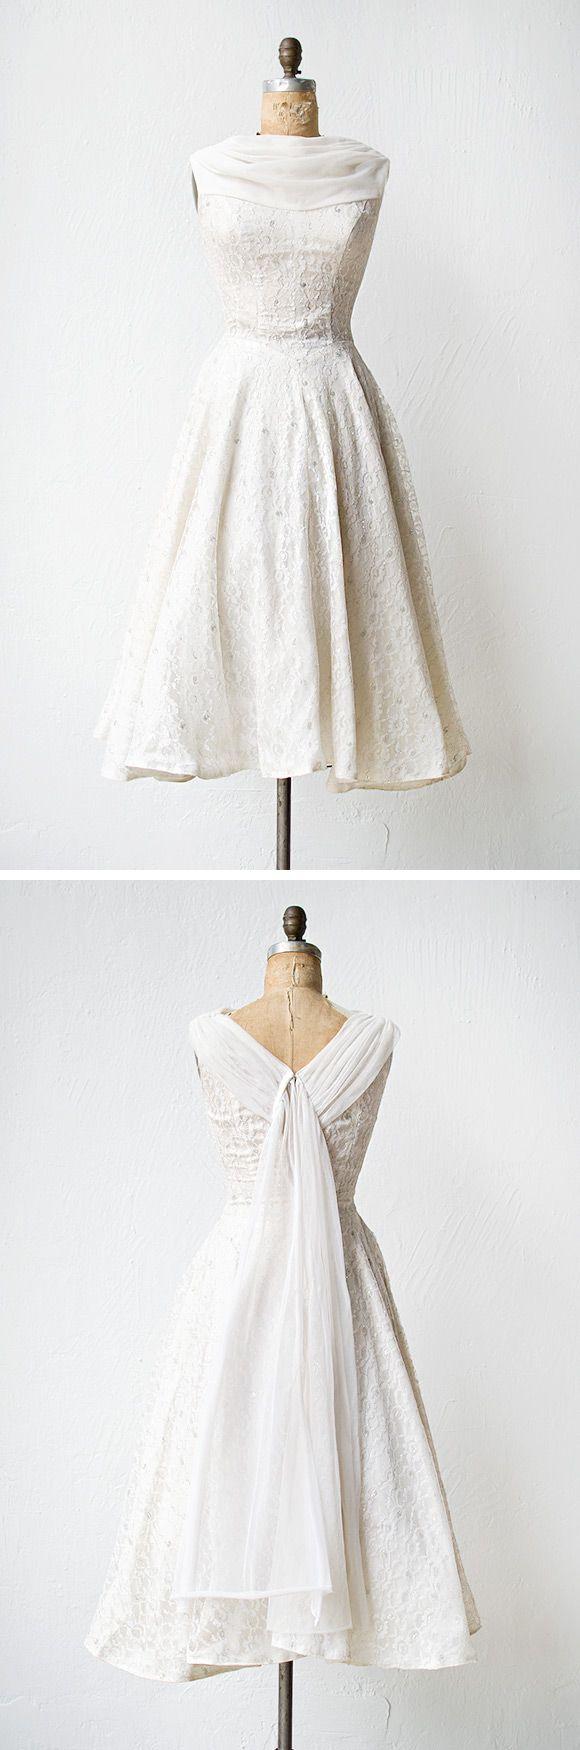 vintage 1950s wedding dress metallic lace thread | Illuminated Love Dress